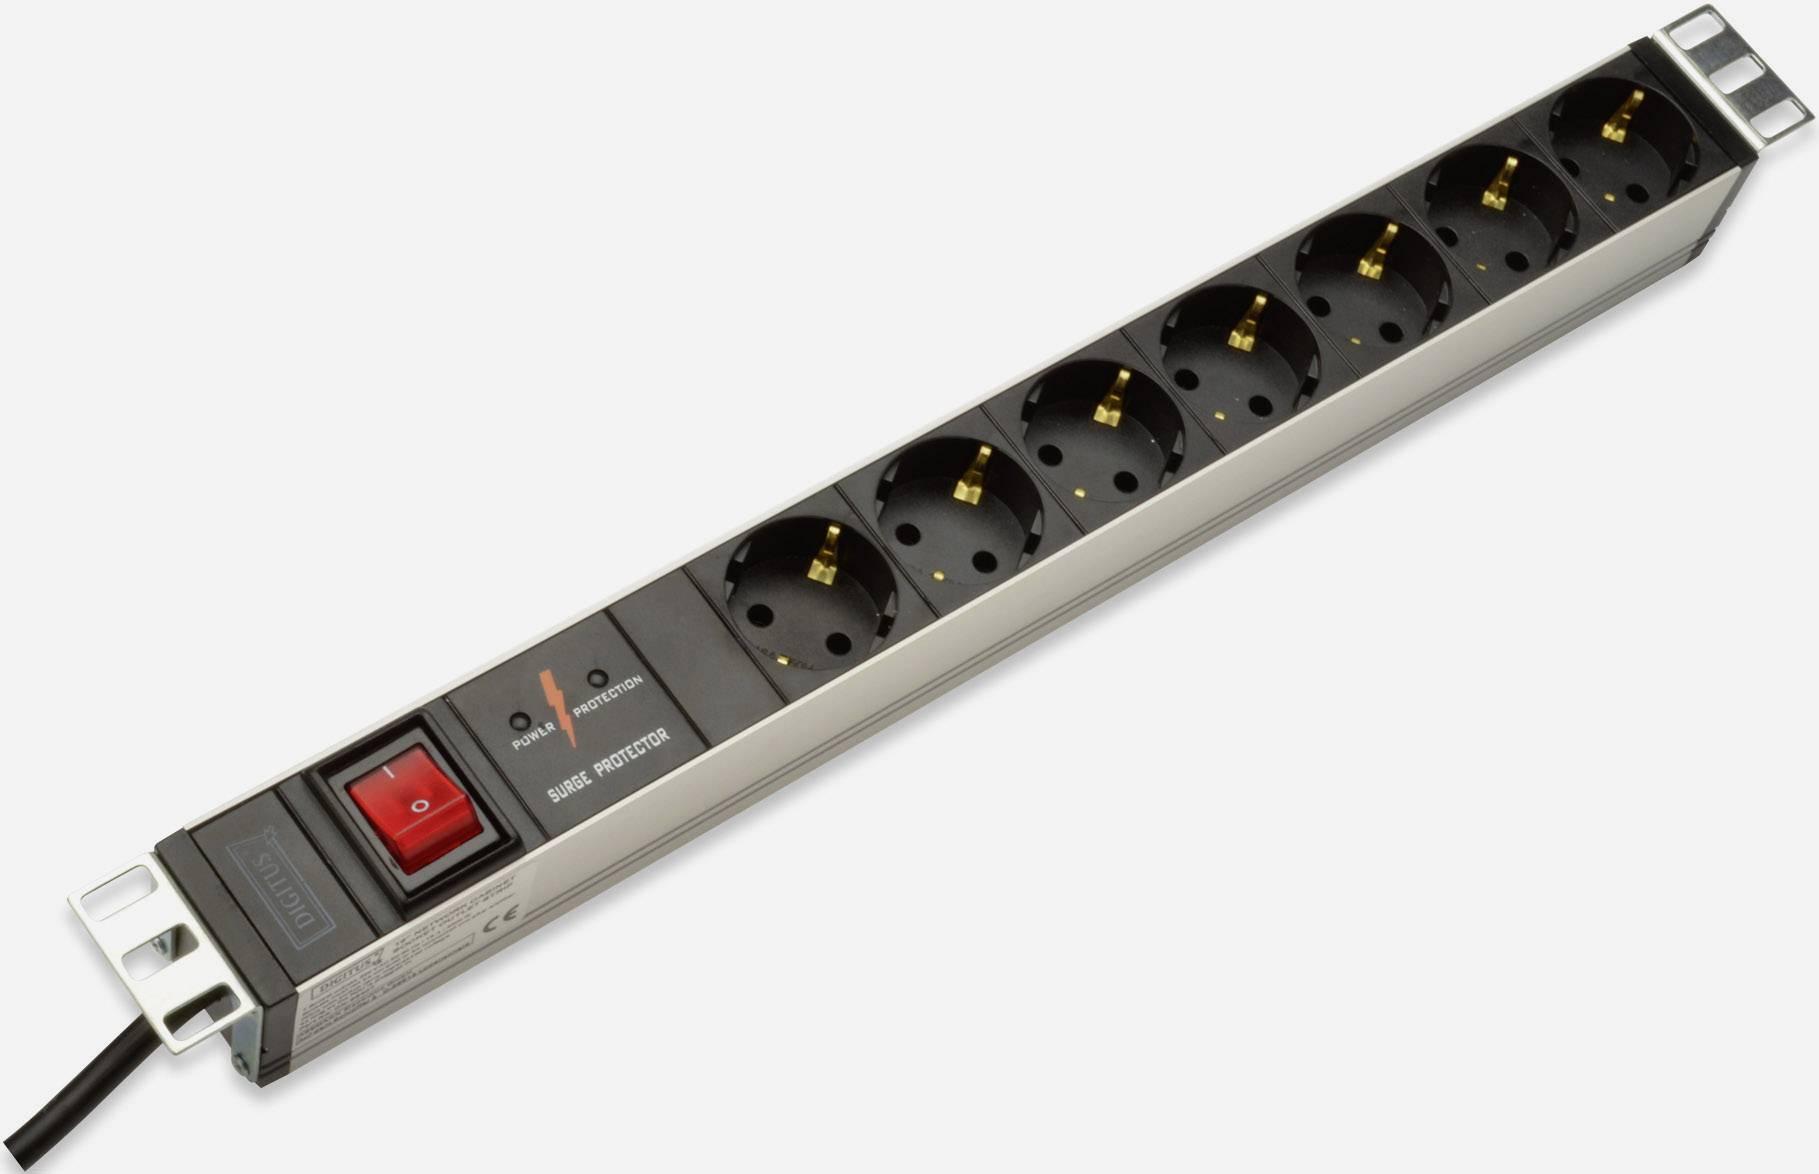 digitus dn 95407 19 inch server rack cabinet power strip 1 he pg socket black